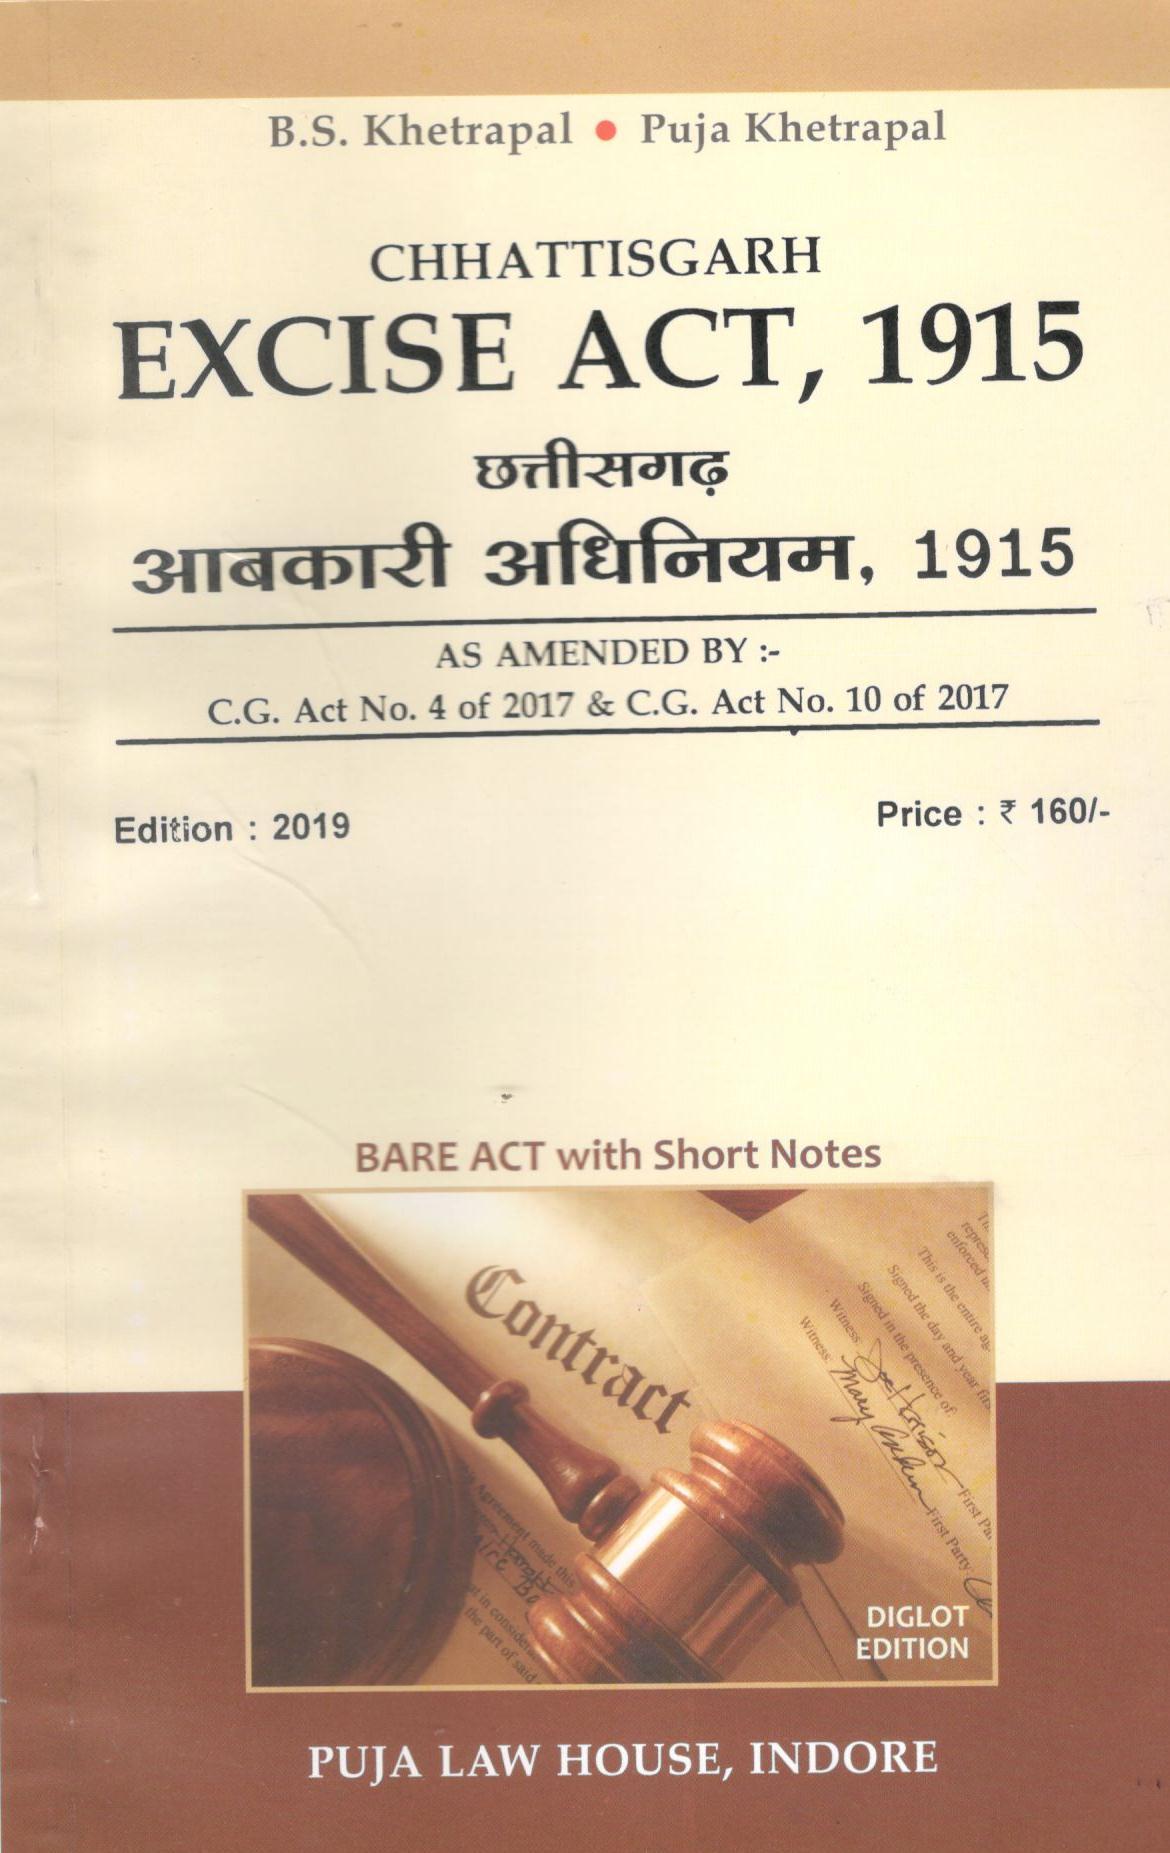 छत्तीसगढ़ आबकारी अधिनियम, 1915 / Chhattisgarh Excise Act, 1915